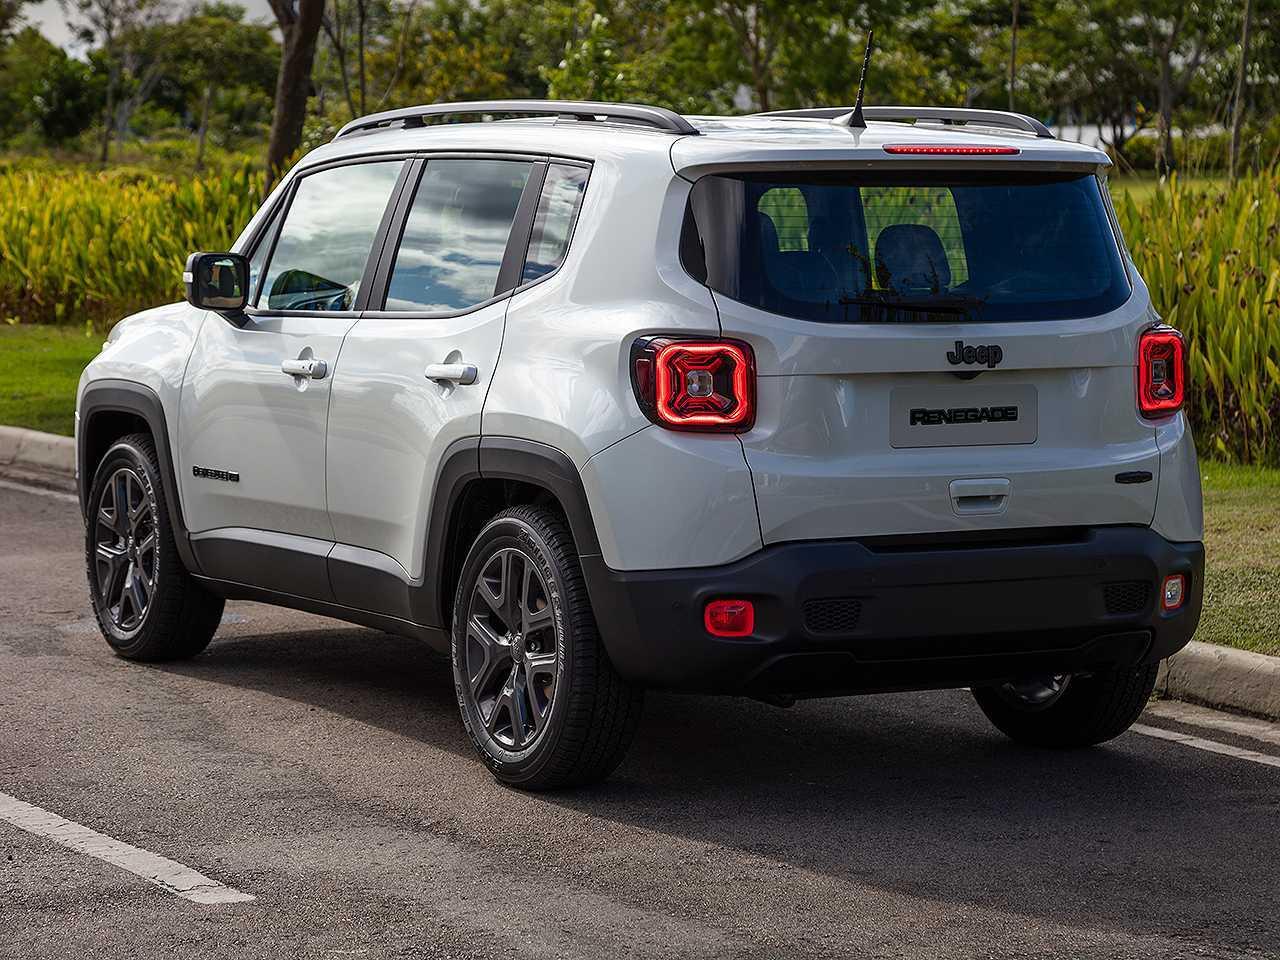 JeepRenegade 2022 - ângulo traseiro